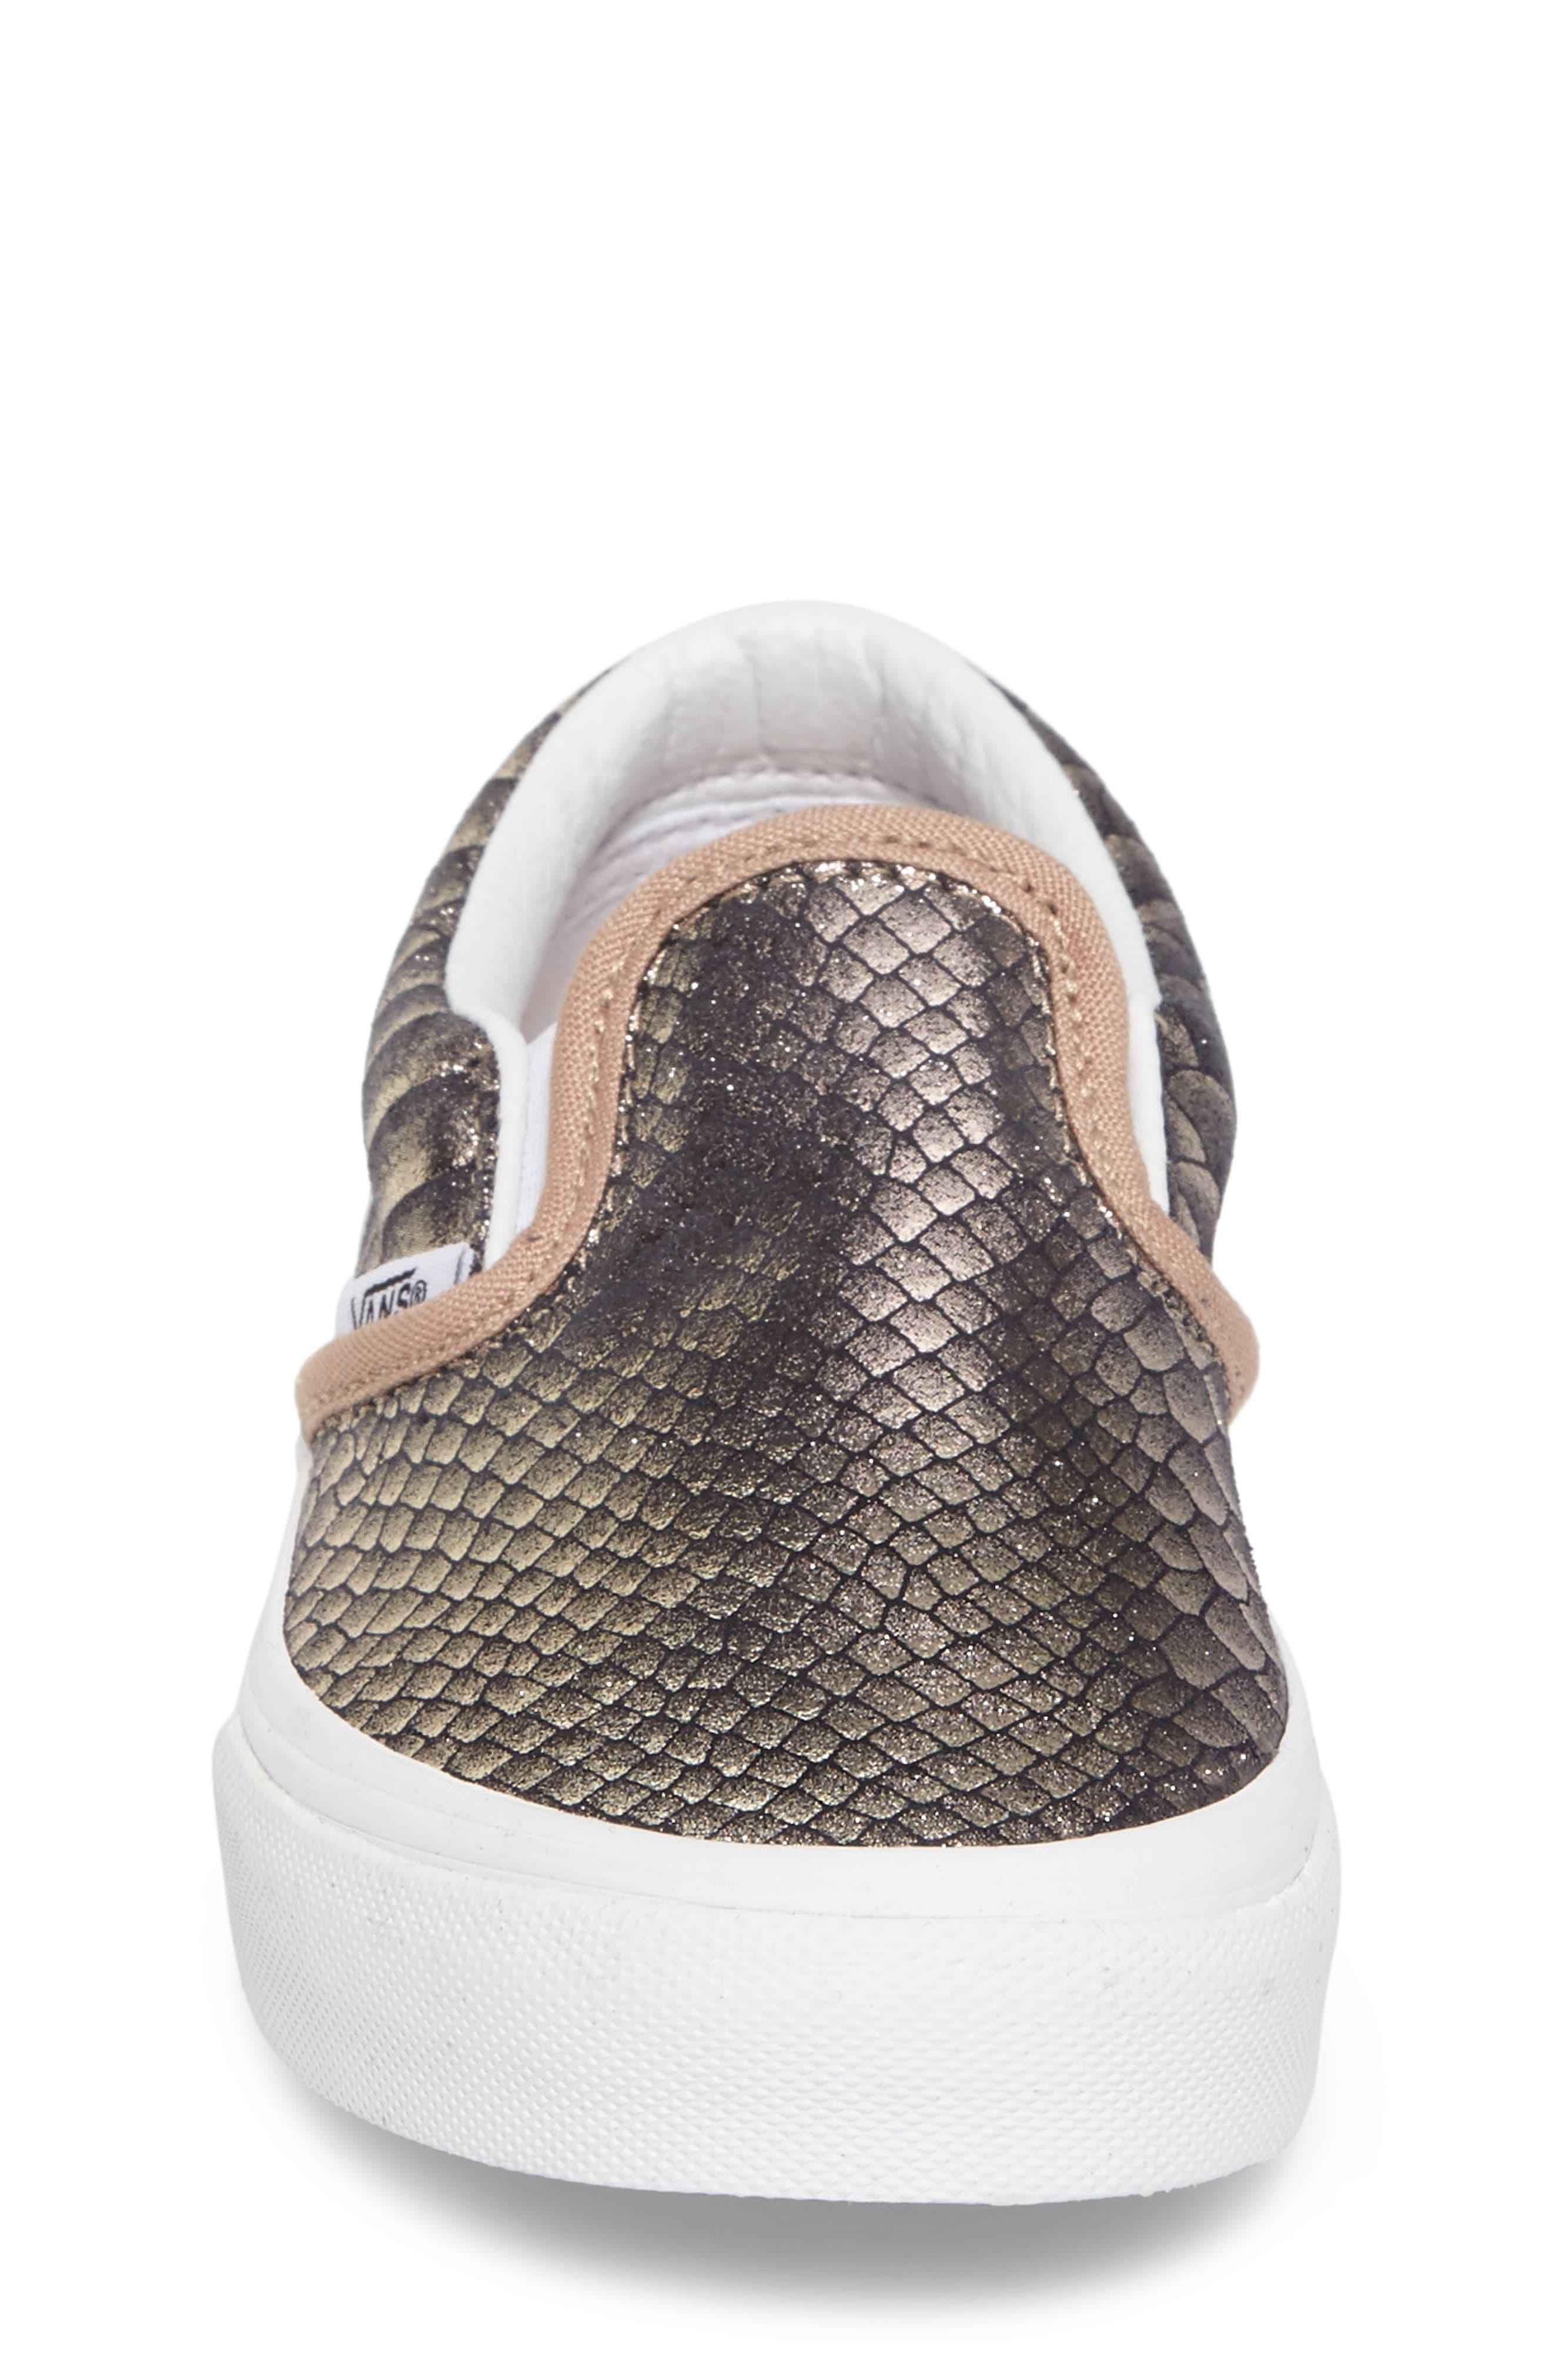 Alternate Image 4  - Vans Classic Slip-On Sneaker (Baby, Walker, Toddler, Little Kid & Big Kid)